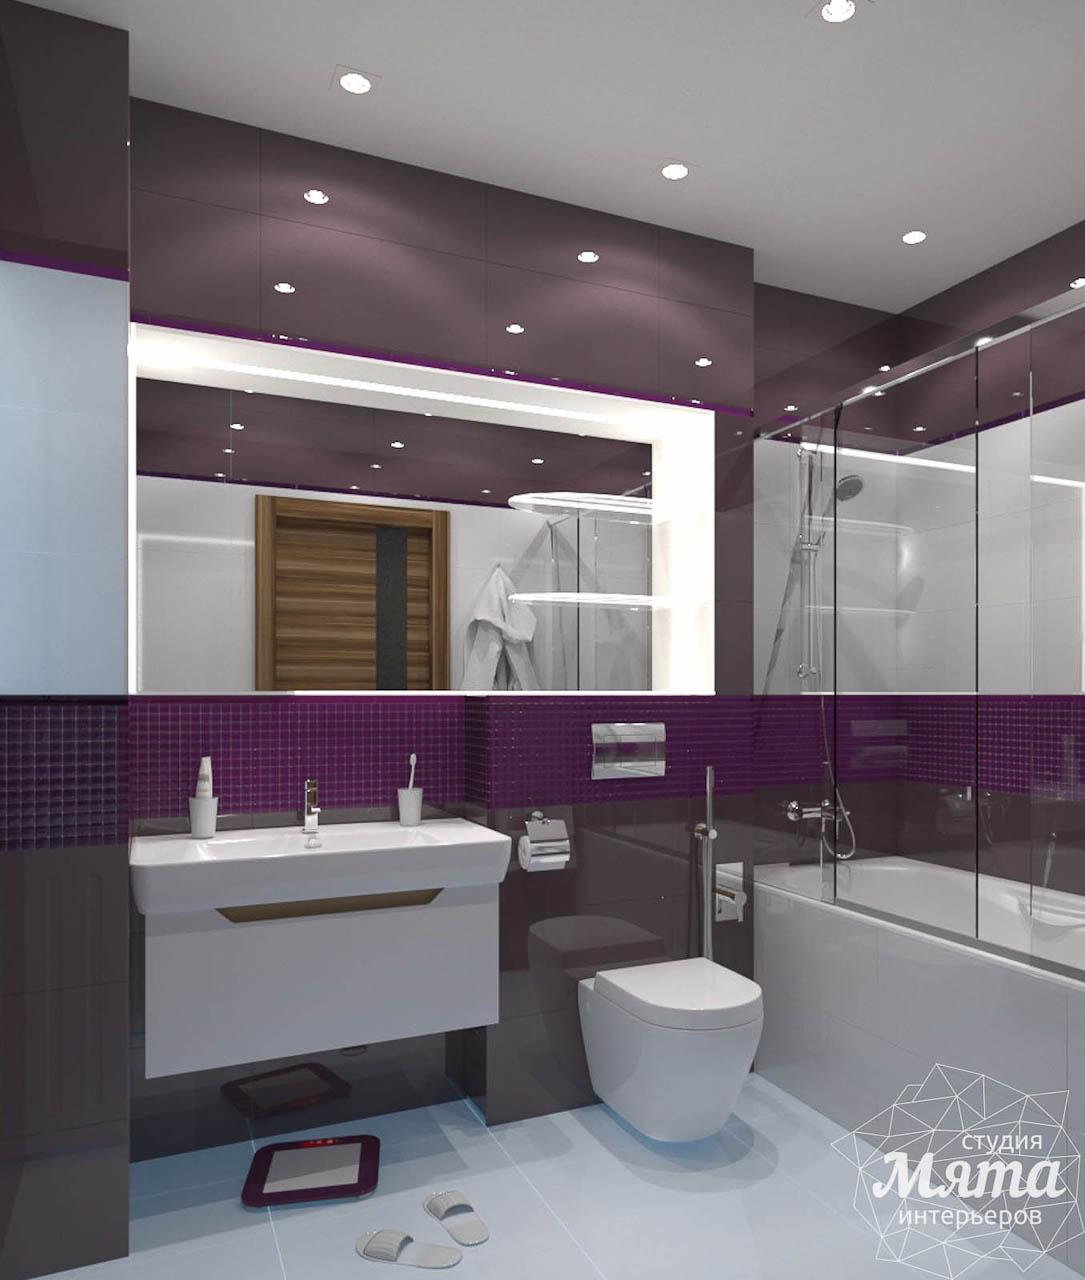 Дизайн интерьера трехкомнатной квартиры по ул. Мельникова 27 img595888927